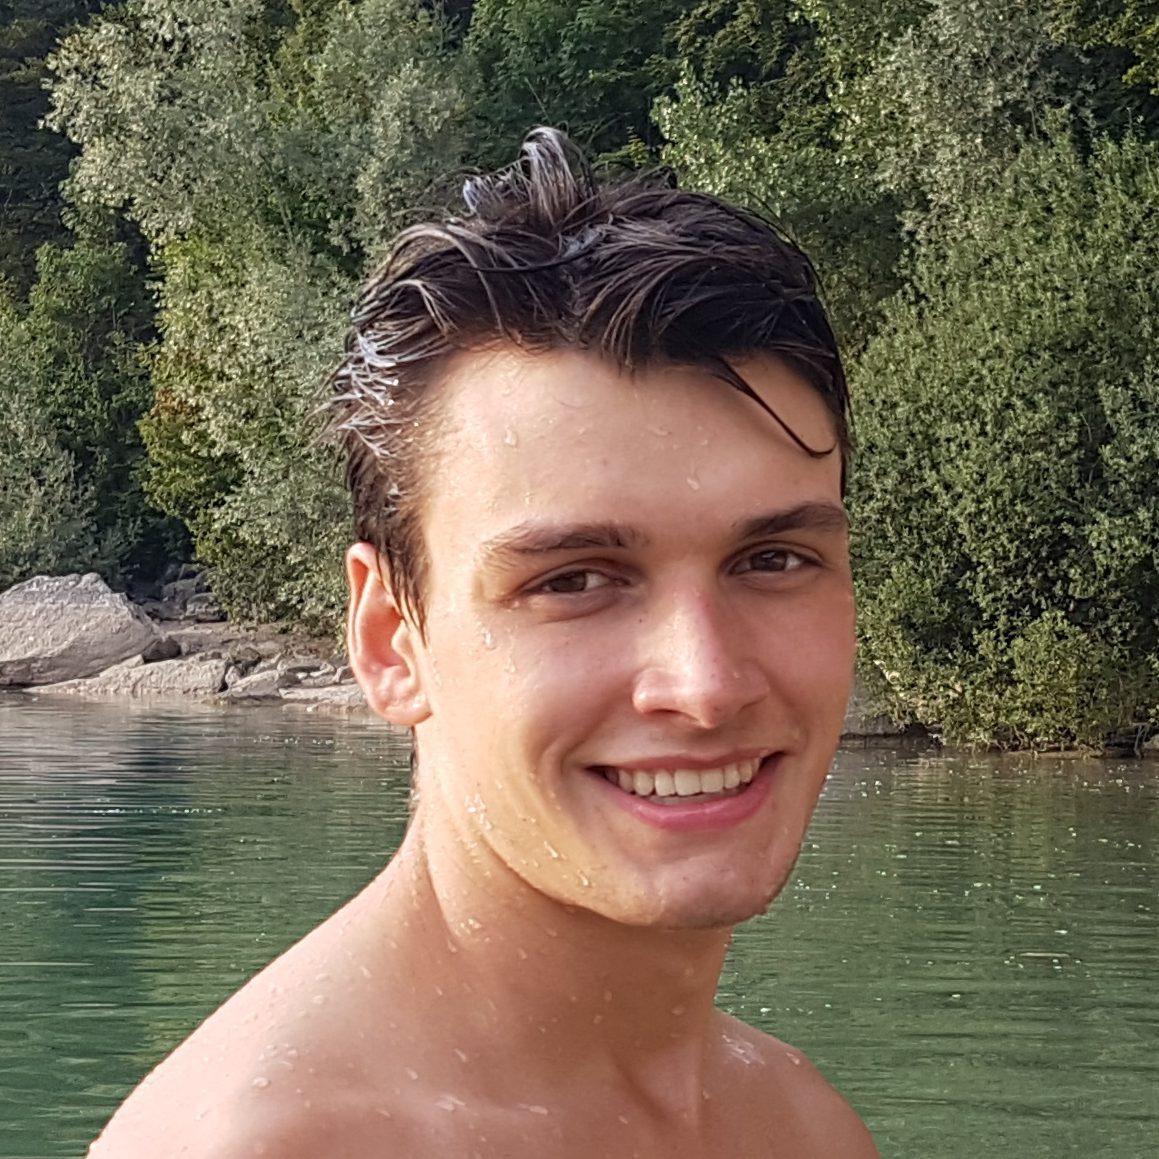 https://gundelfinger-turnerschaft.de/wp-content/uploads/trainer_julius_jehle-e1567788460715.jpg